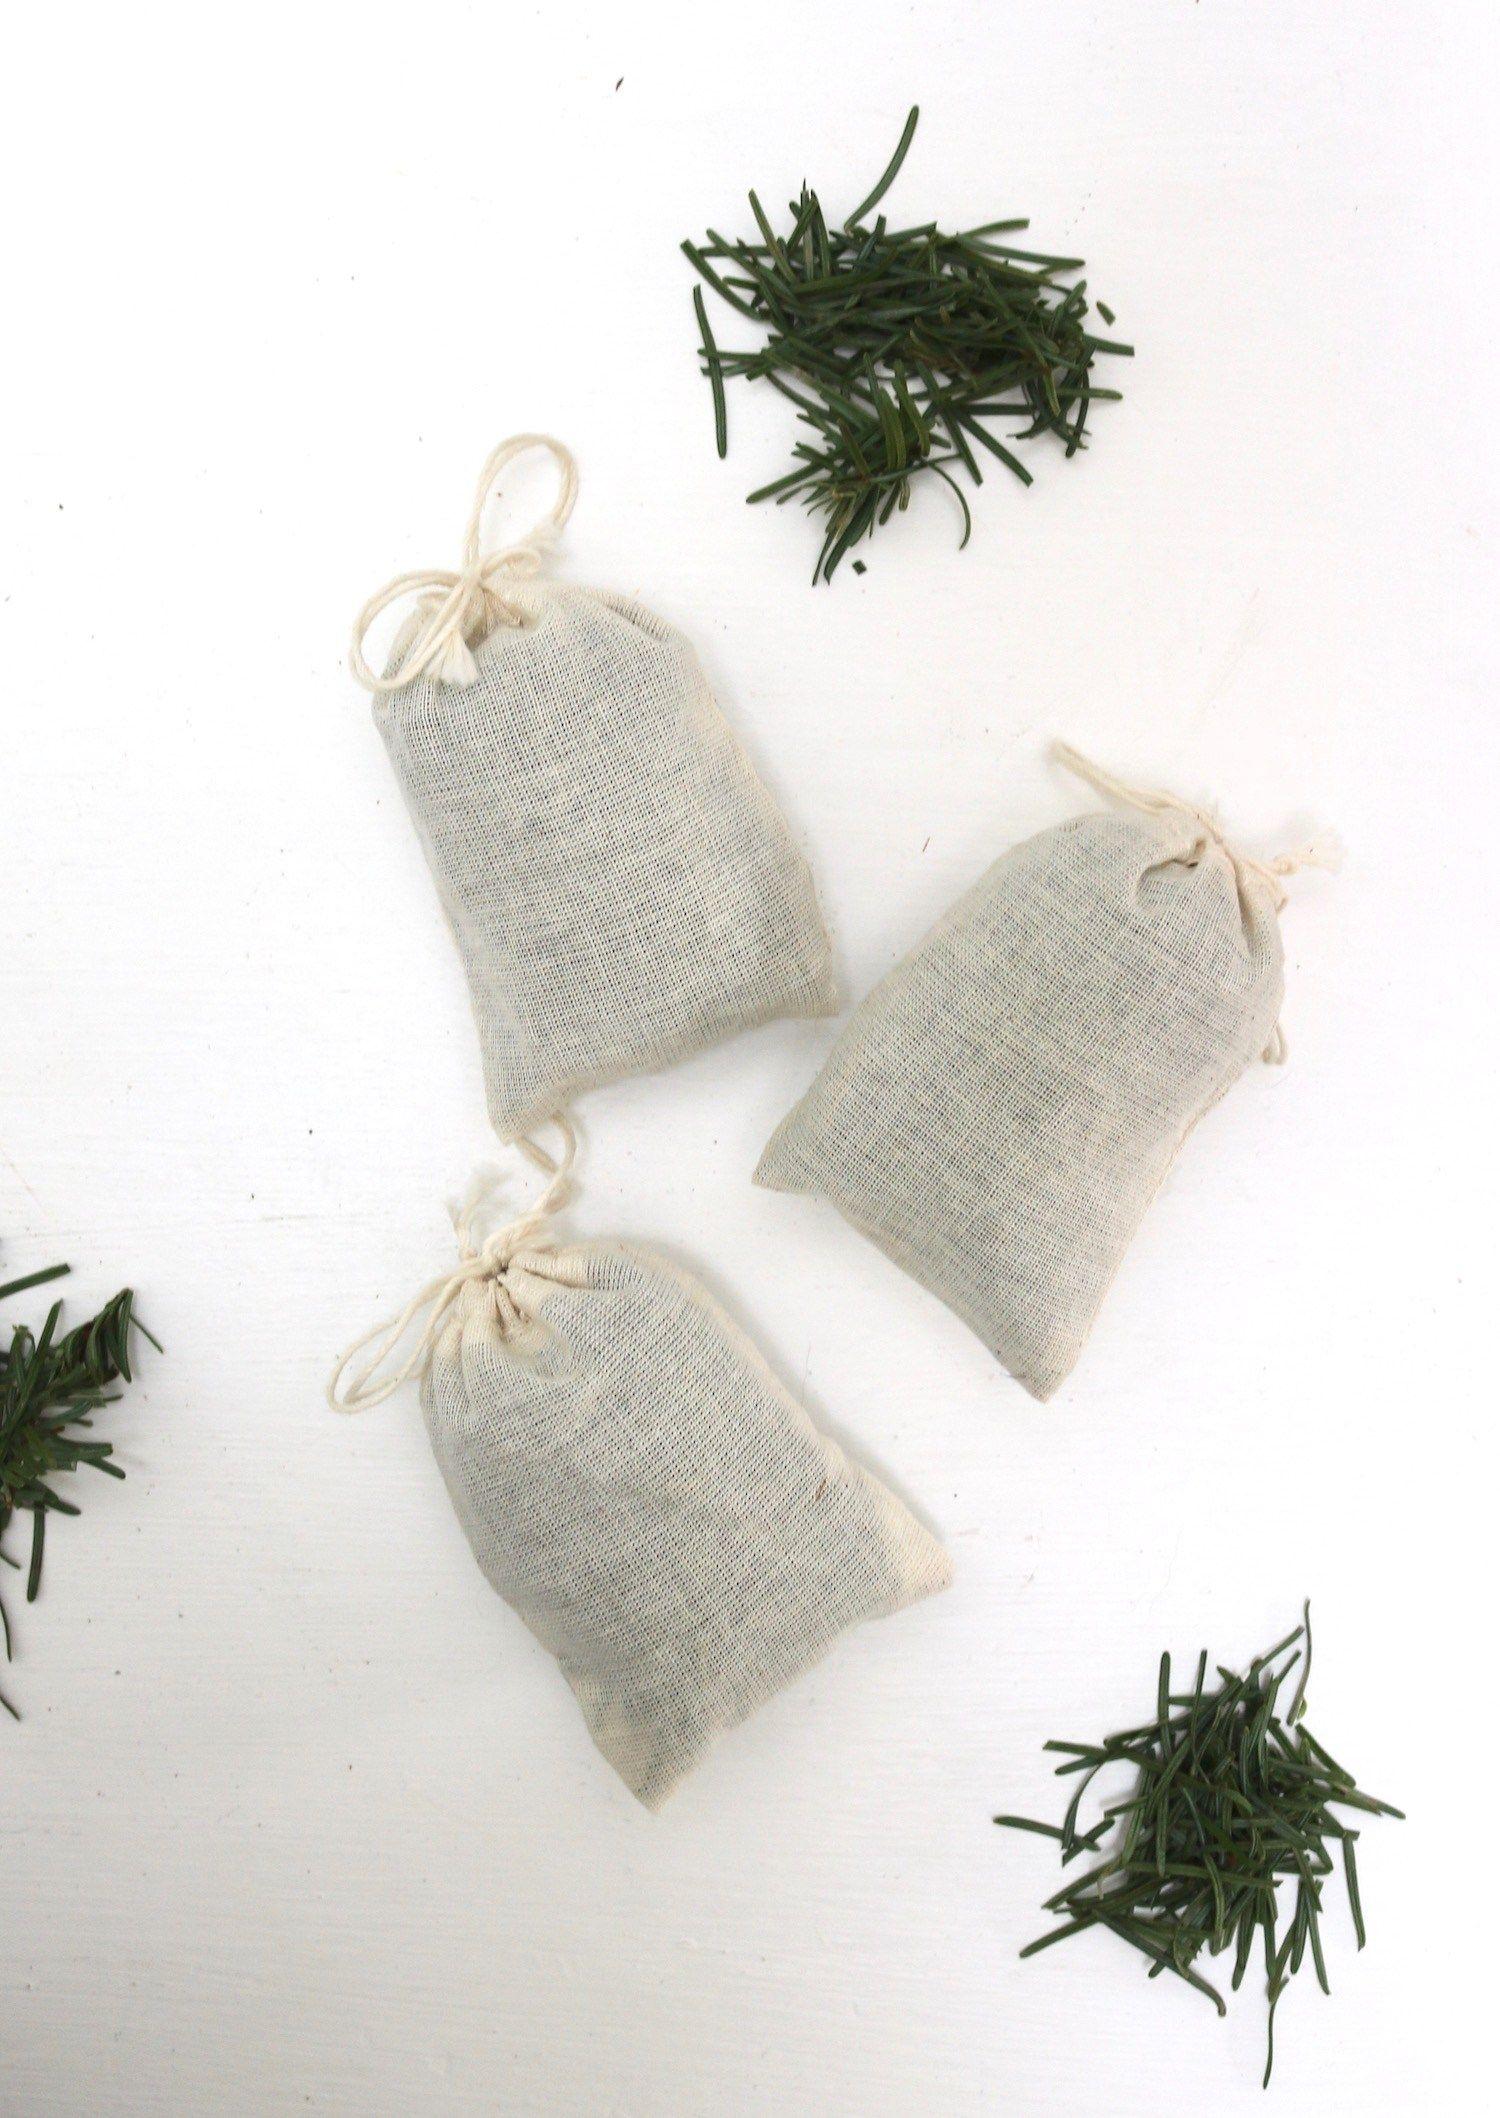 Diy pine needle sachets recycle your tree zero waste living